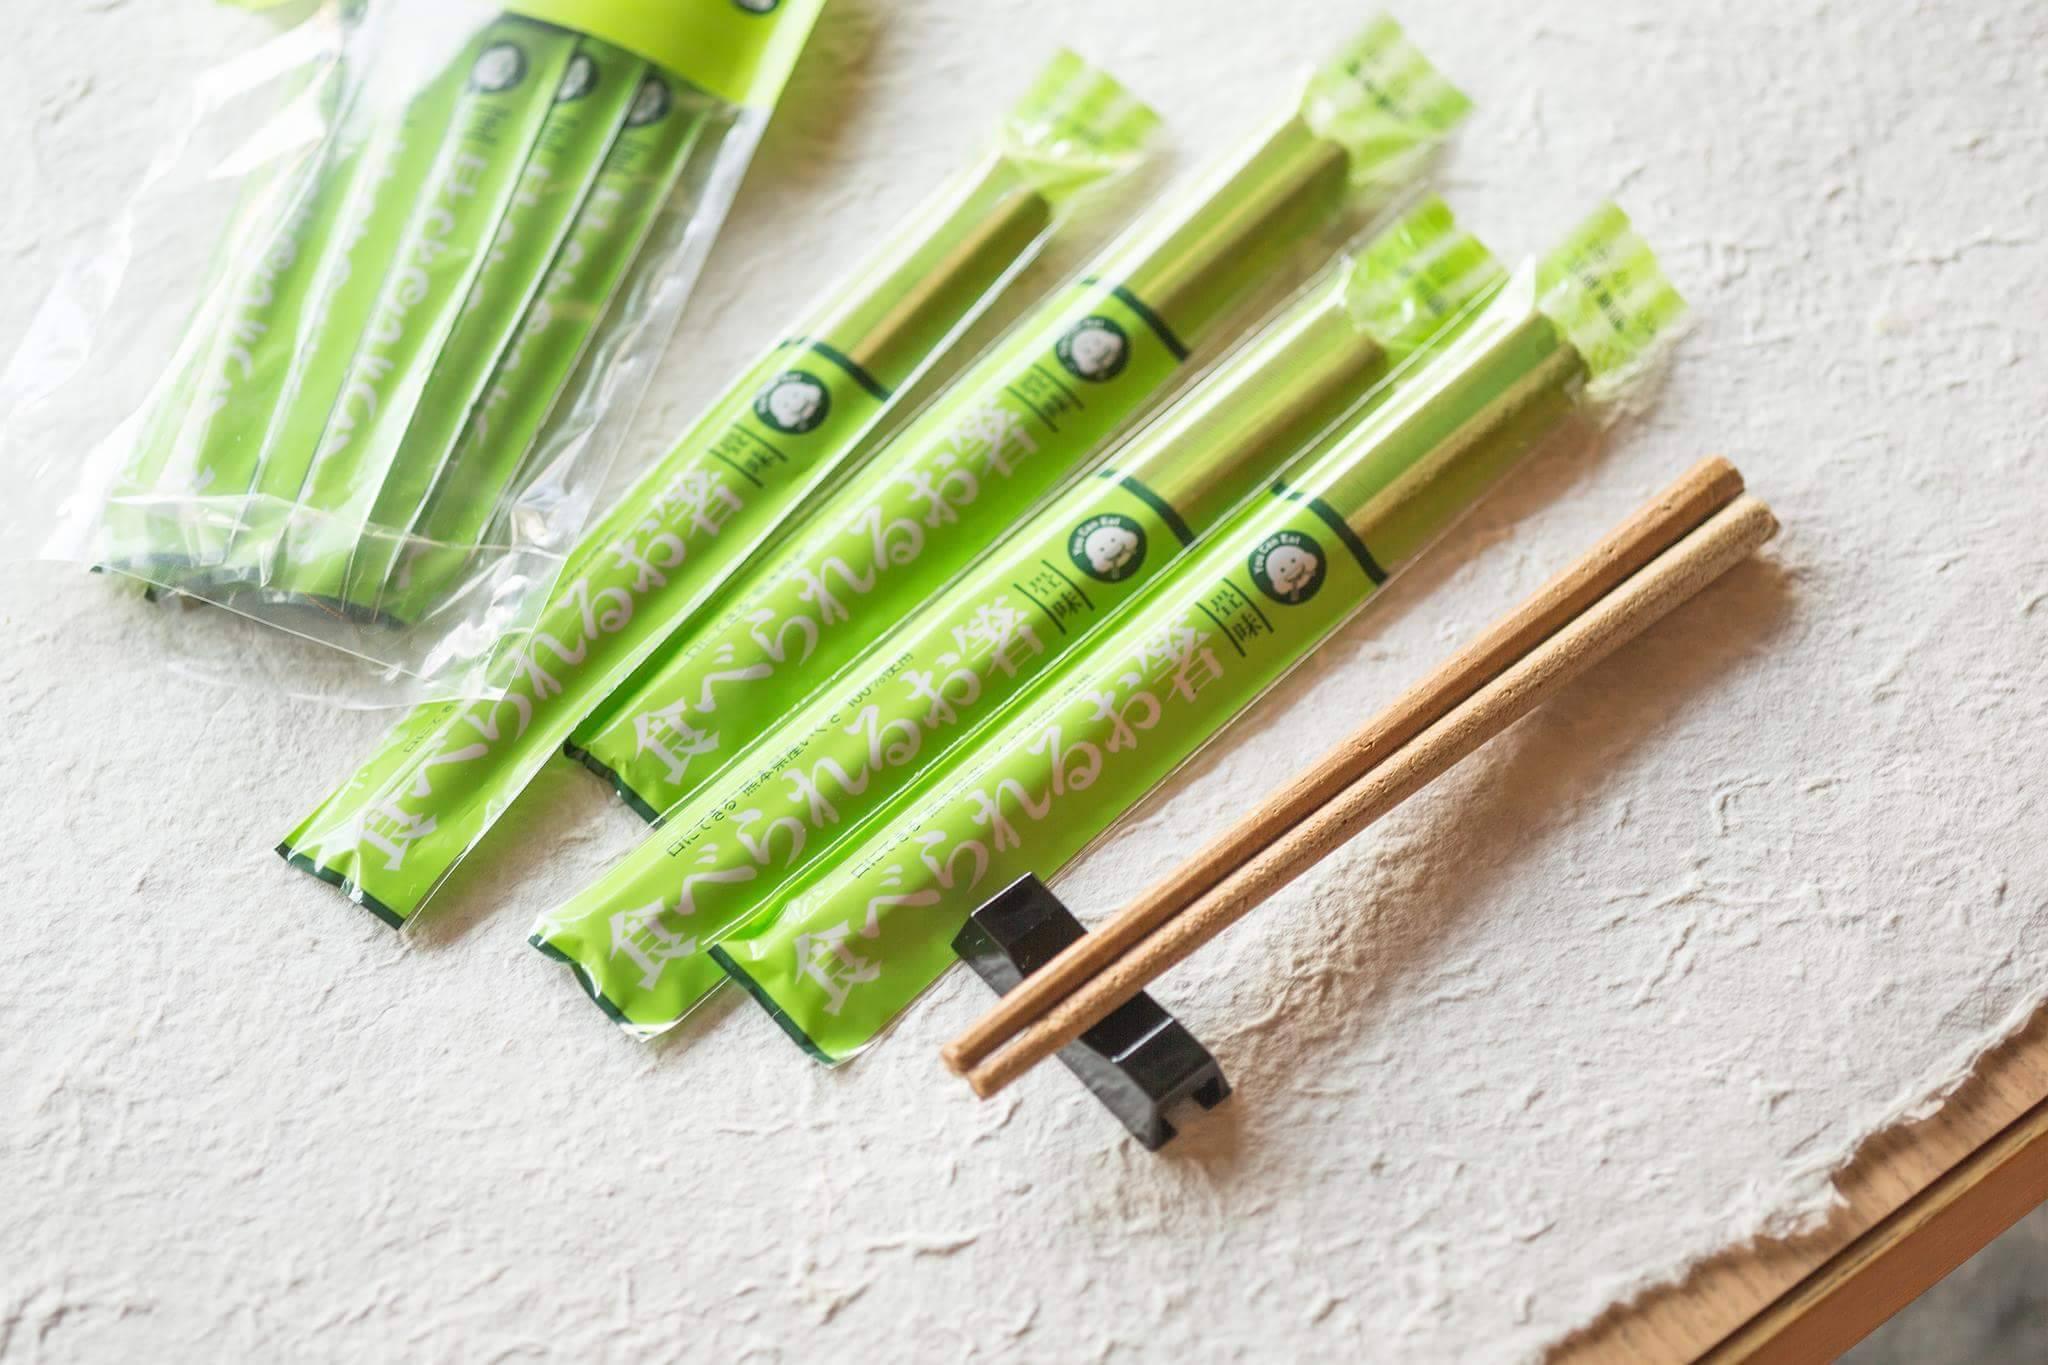 Edible chopsticks